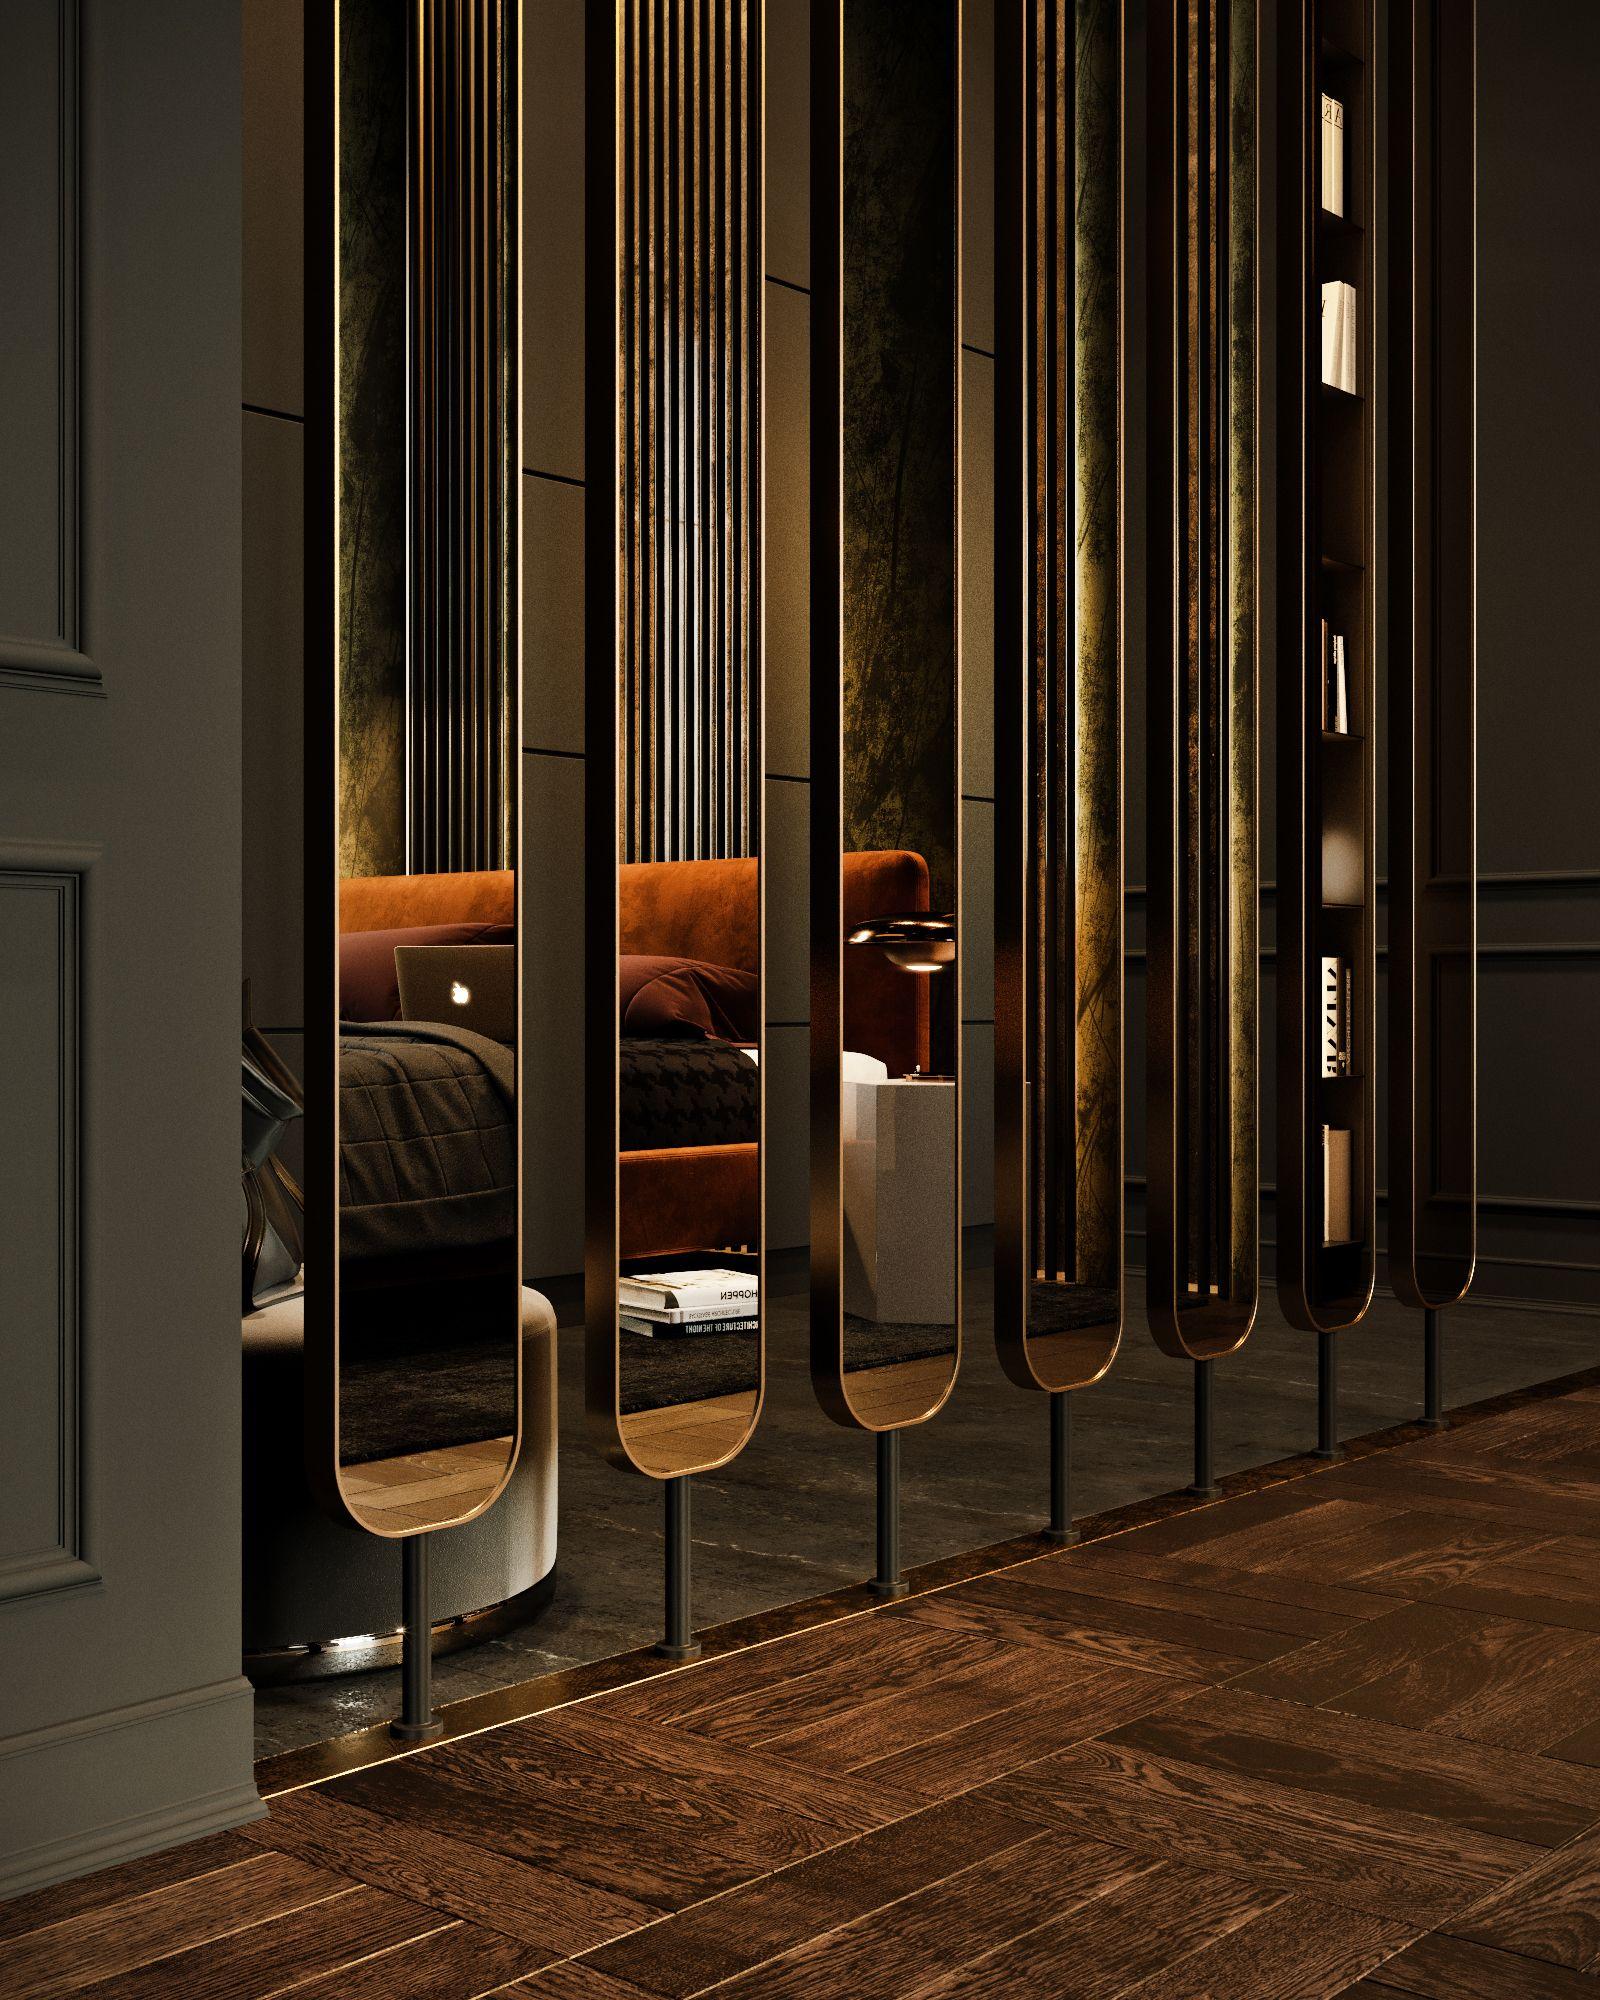 Dillards Furniture Austin: Morgan Lewis Adlı Kullanıcının Night Club Lighting